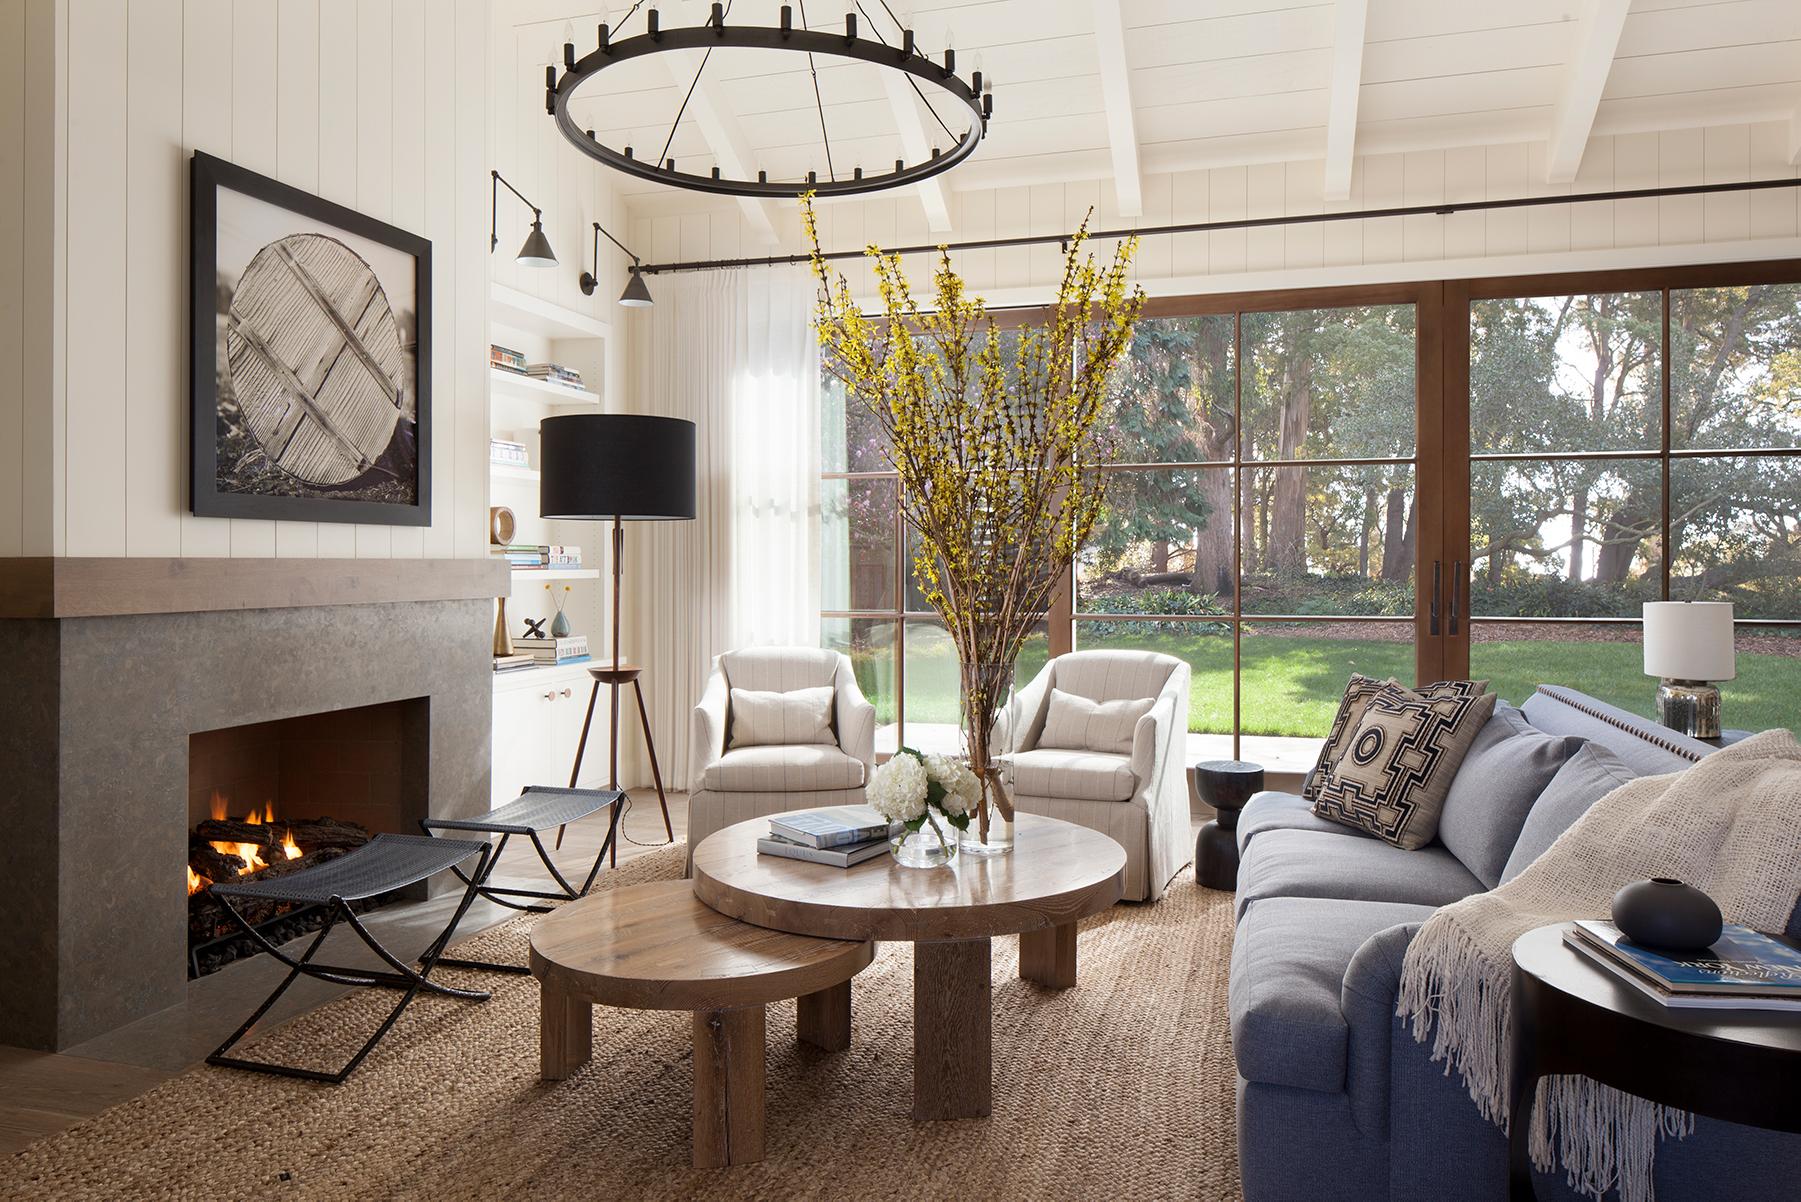 Jennifer_robins_interiors_projects_menlo_park_Garland_05_living_room_LR_fireplace